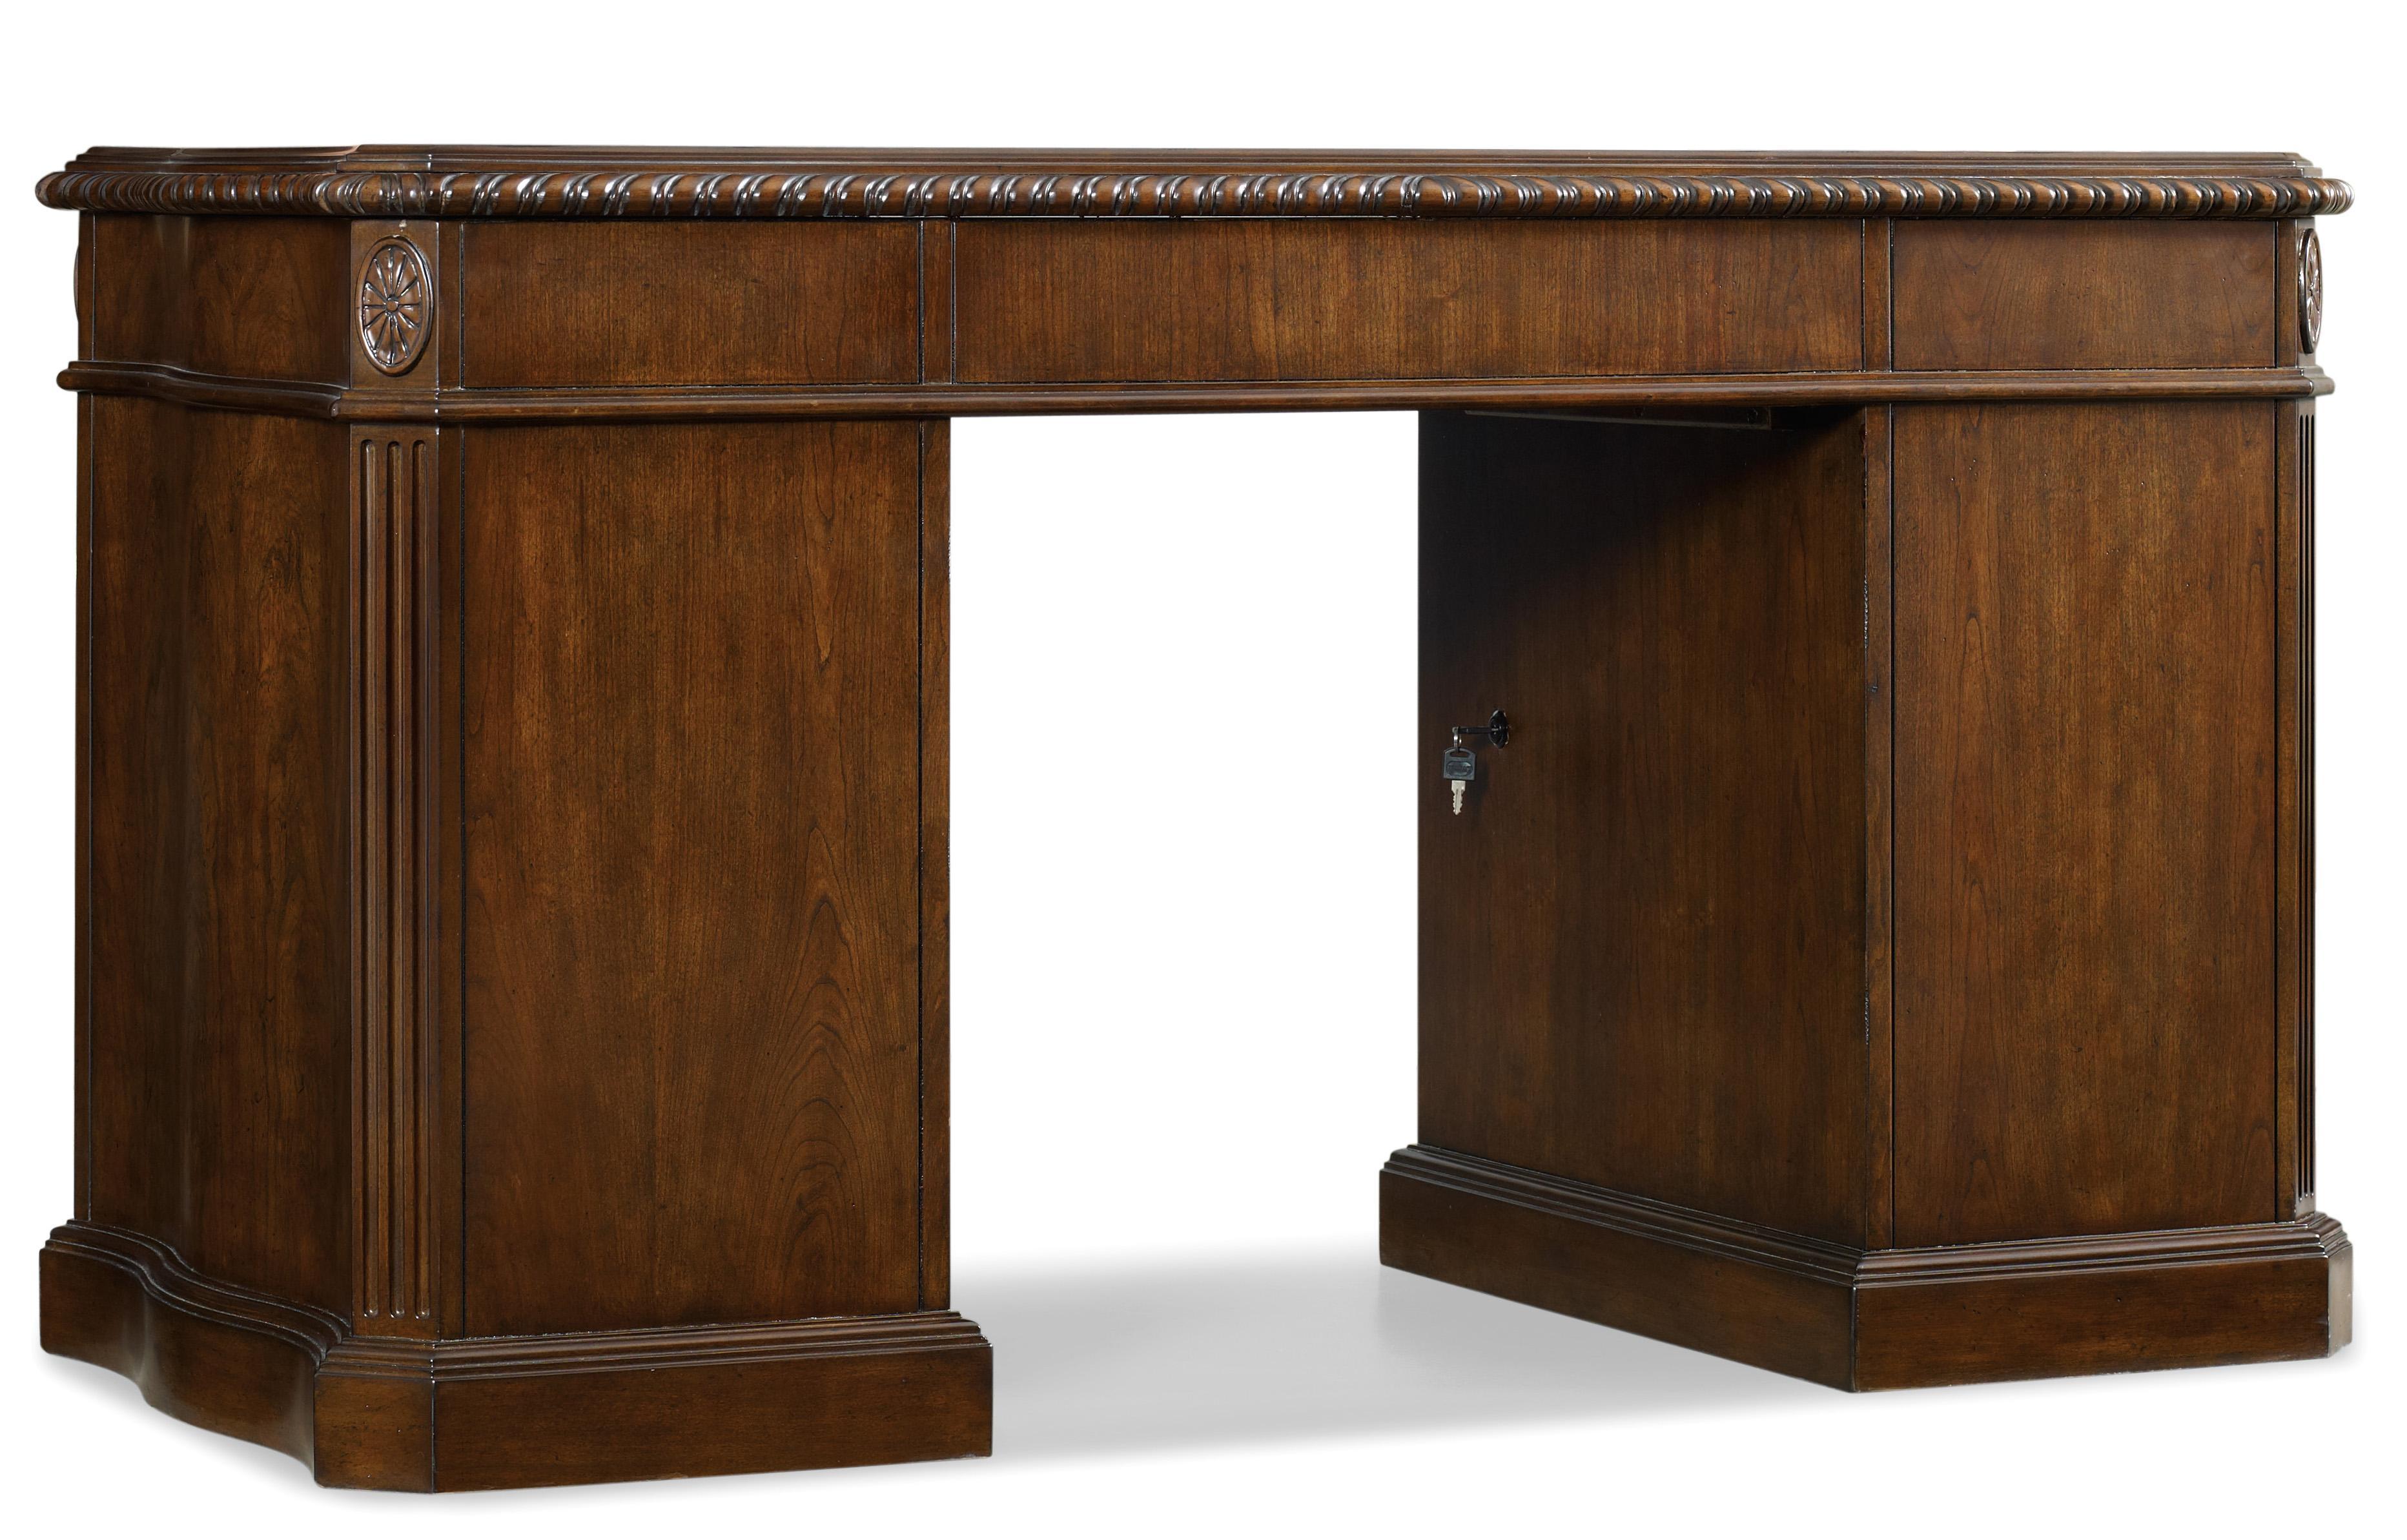 Home Office Kneehole Desk by Hooker Furniture at Baer's Furniture